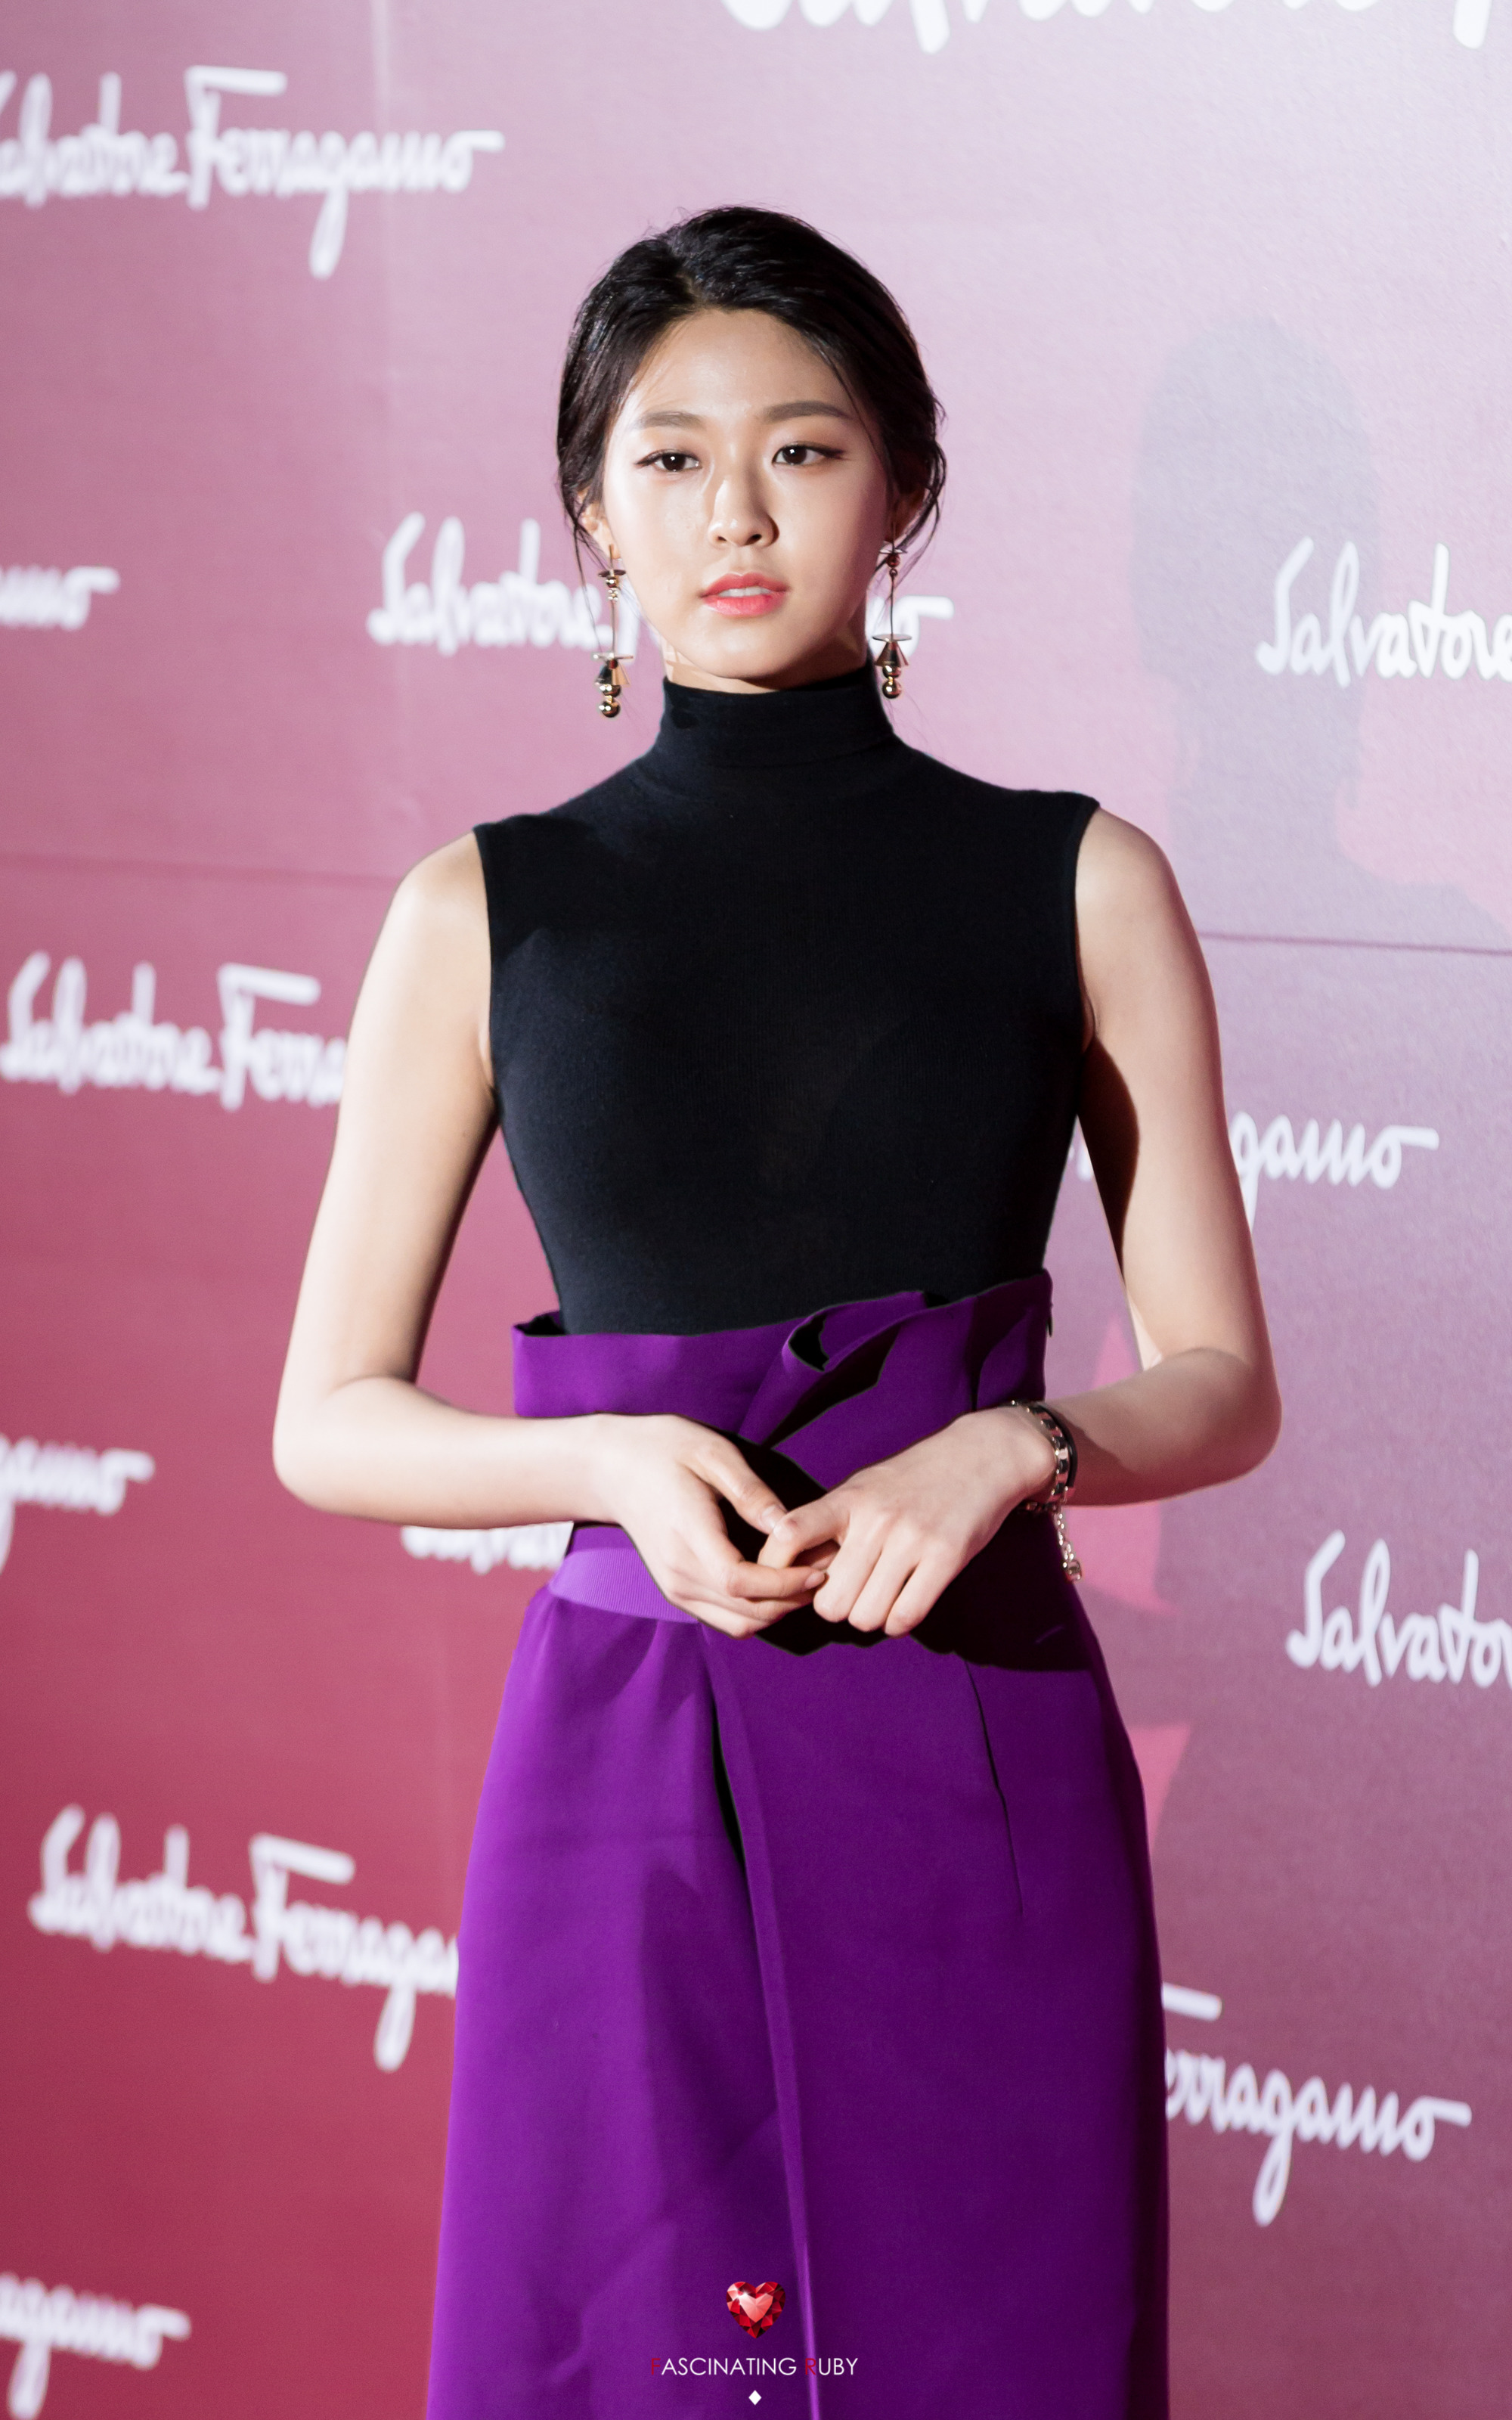 kpop idol waist, girl group members waist, female idol waist, oh my girl yooa waist, twice tzuyu waist, lovelyz ryu soojeong waist, seolhyun waist